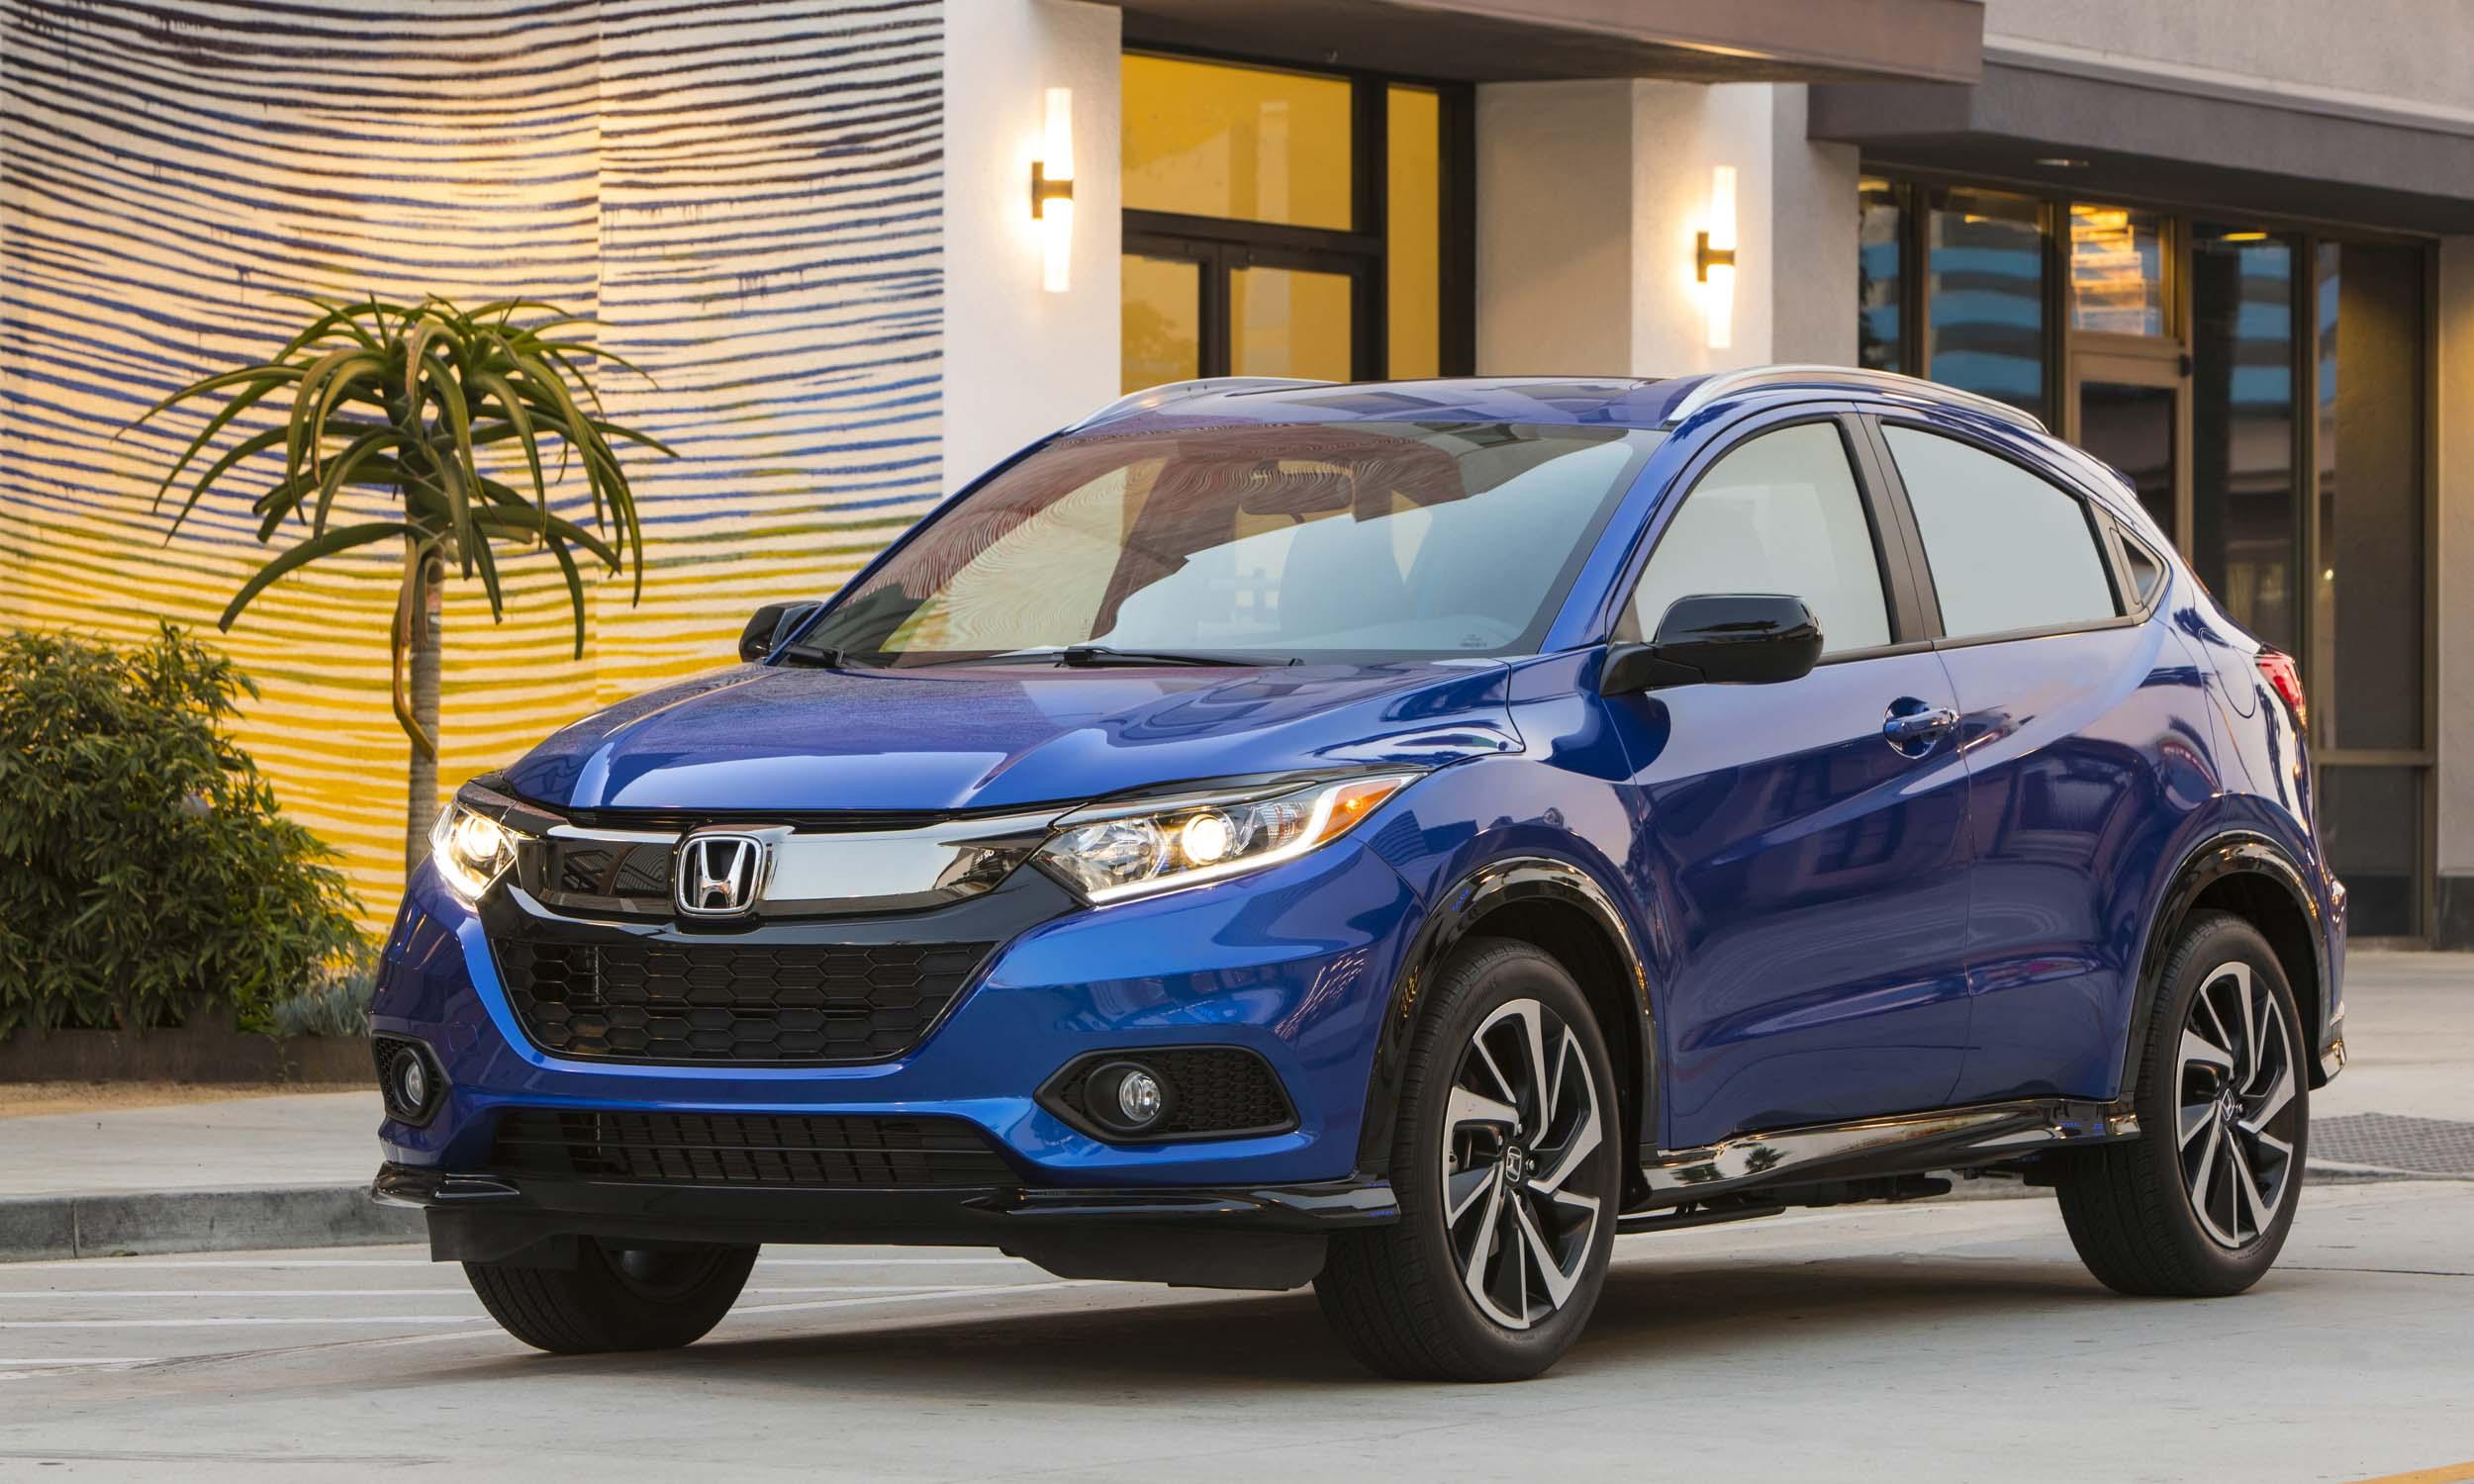 © American Honda Motors